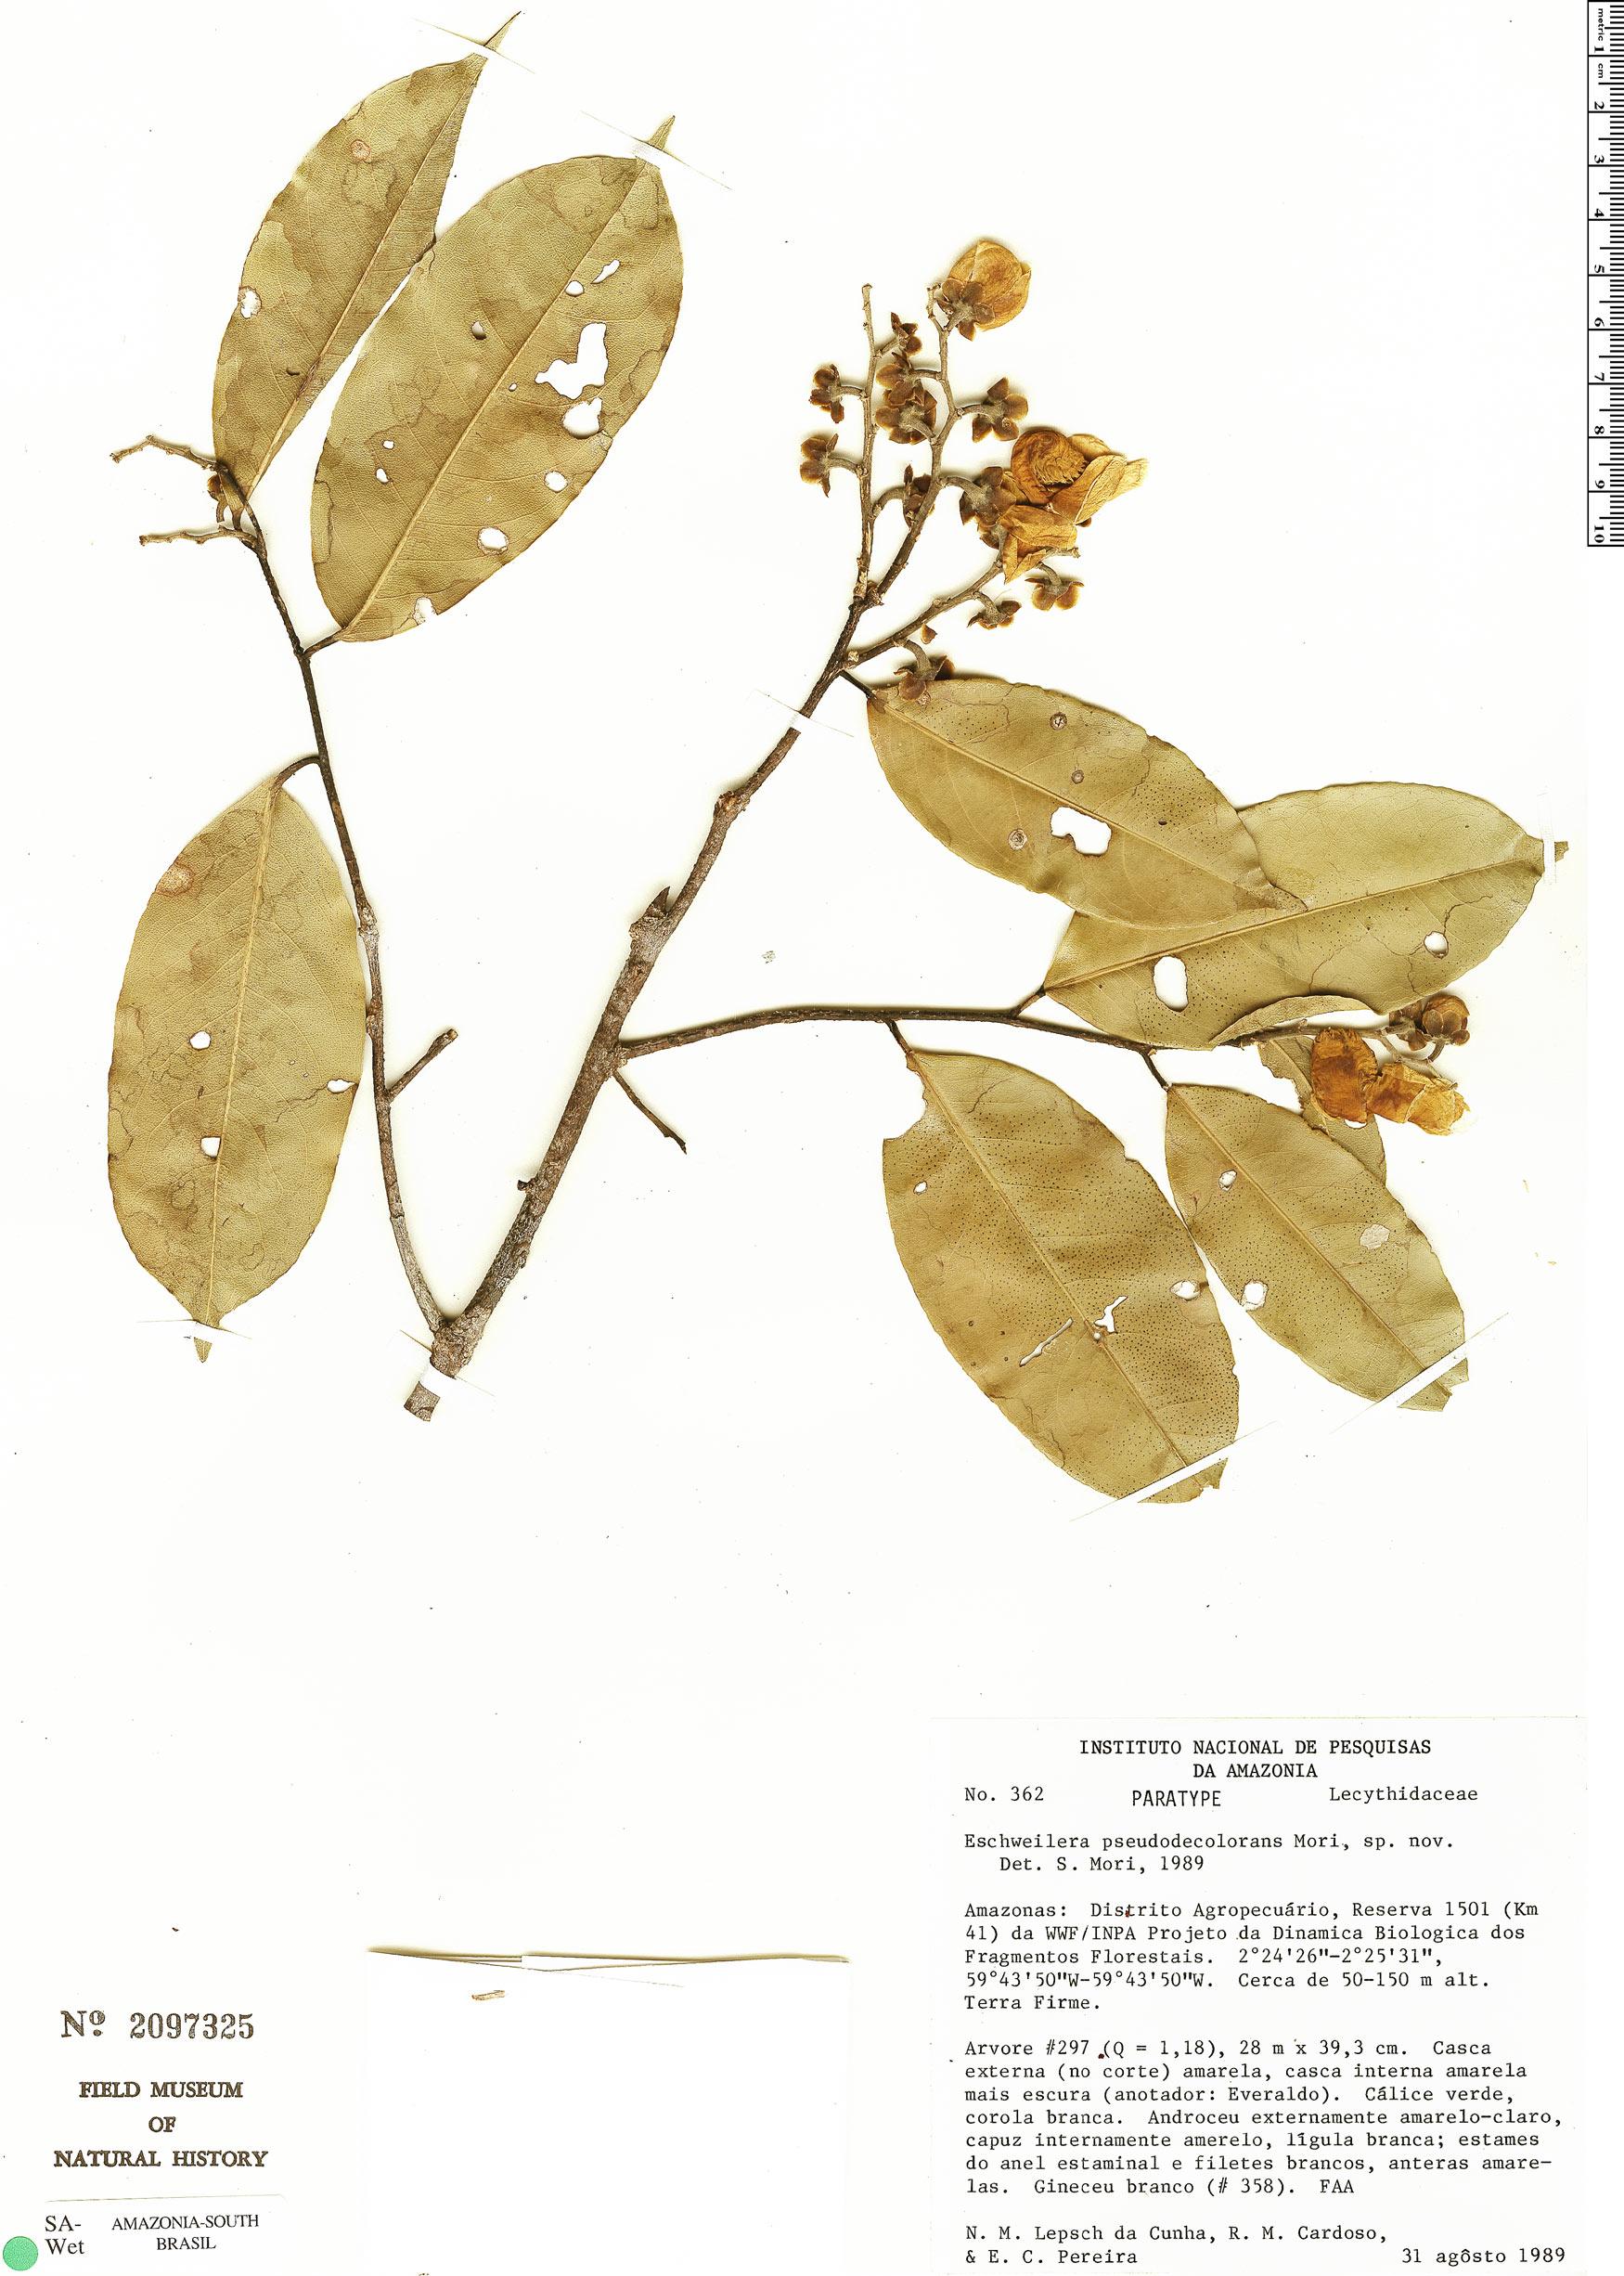 Specimen: Eschweilera pseudodecolorans